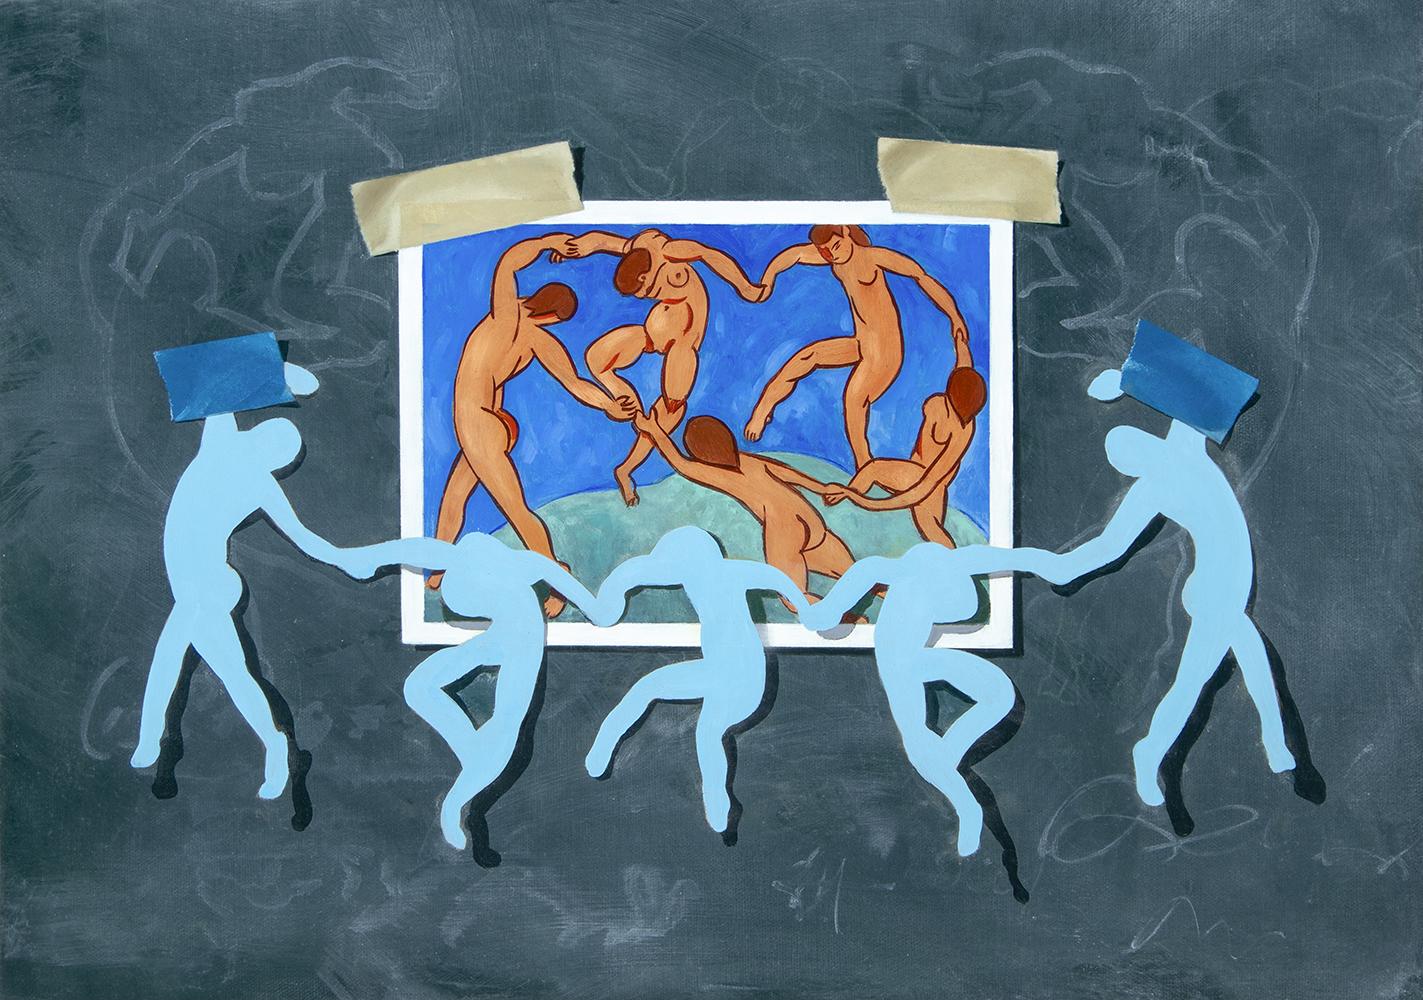 richard_hall_z1112_paper_dancers.jpg